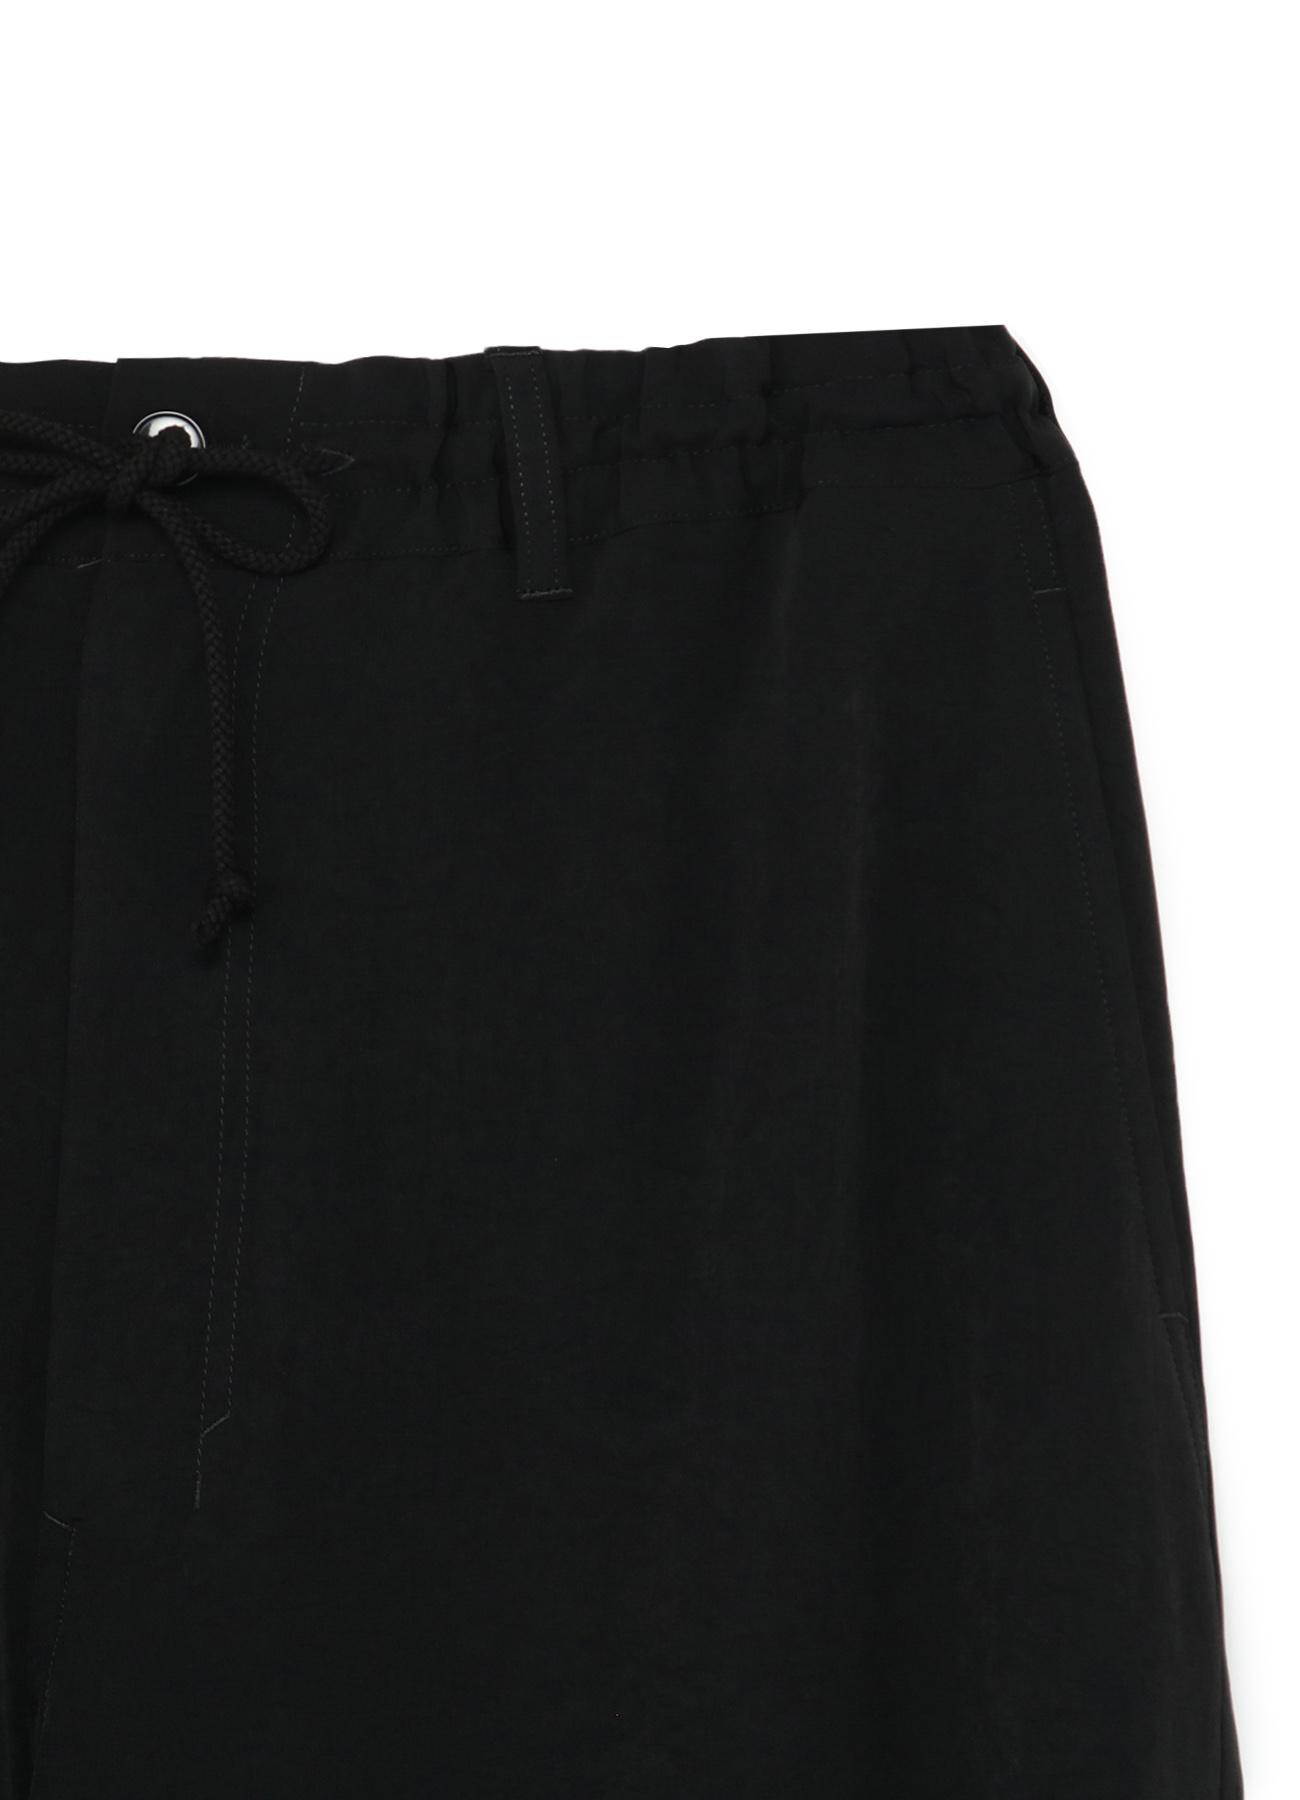 T/A Vintage Decyne Easy Balloon Pants